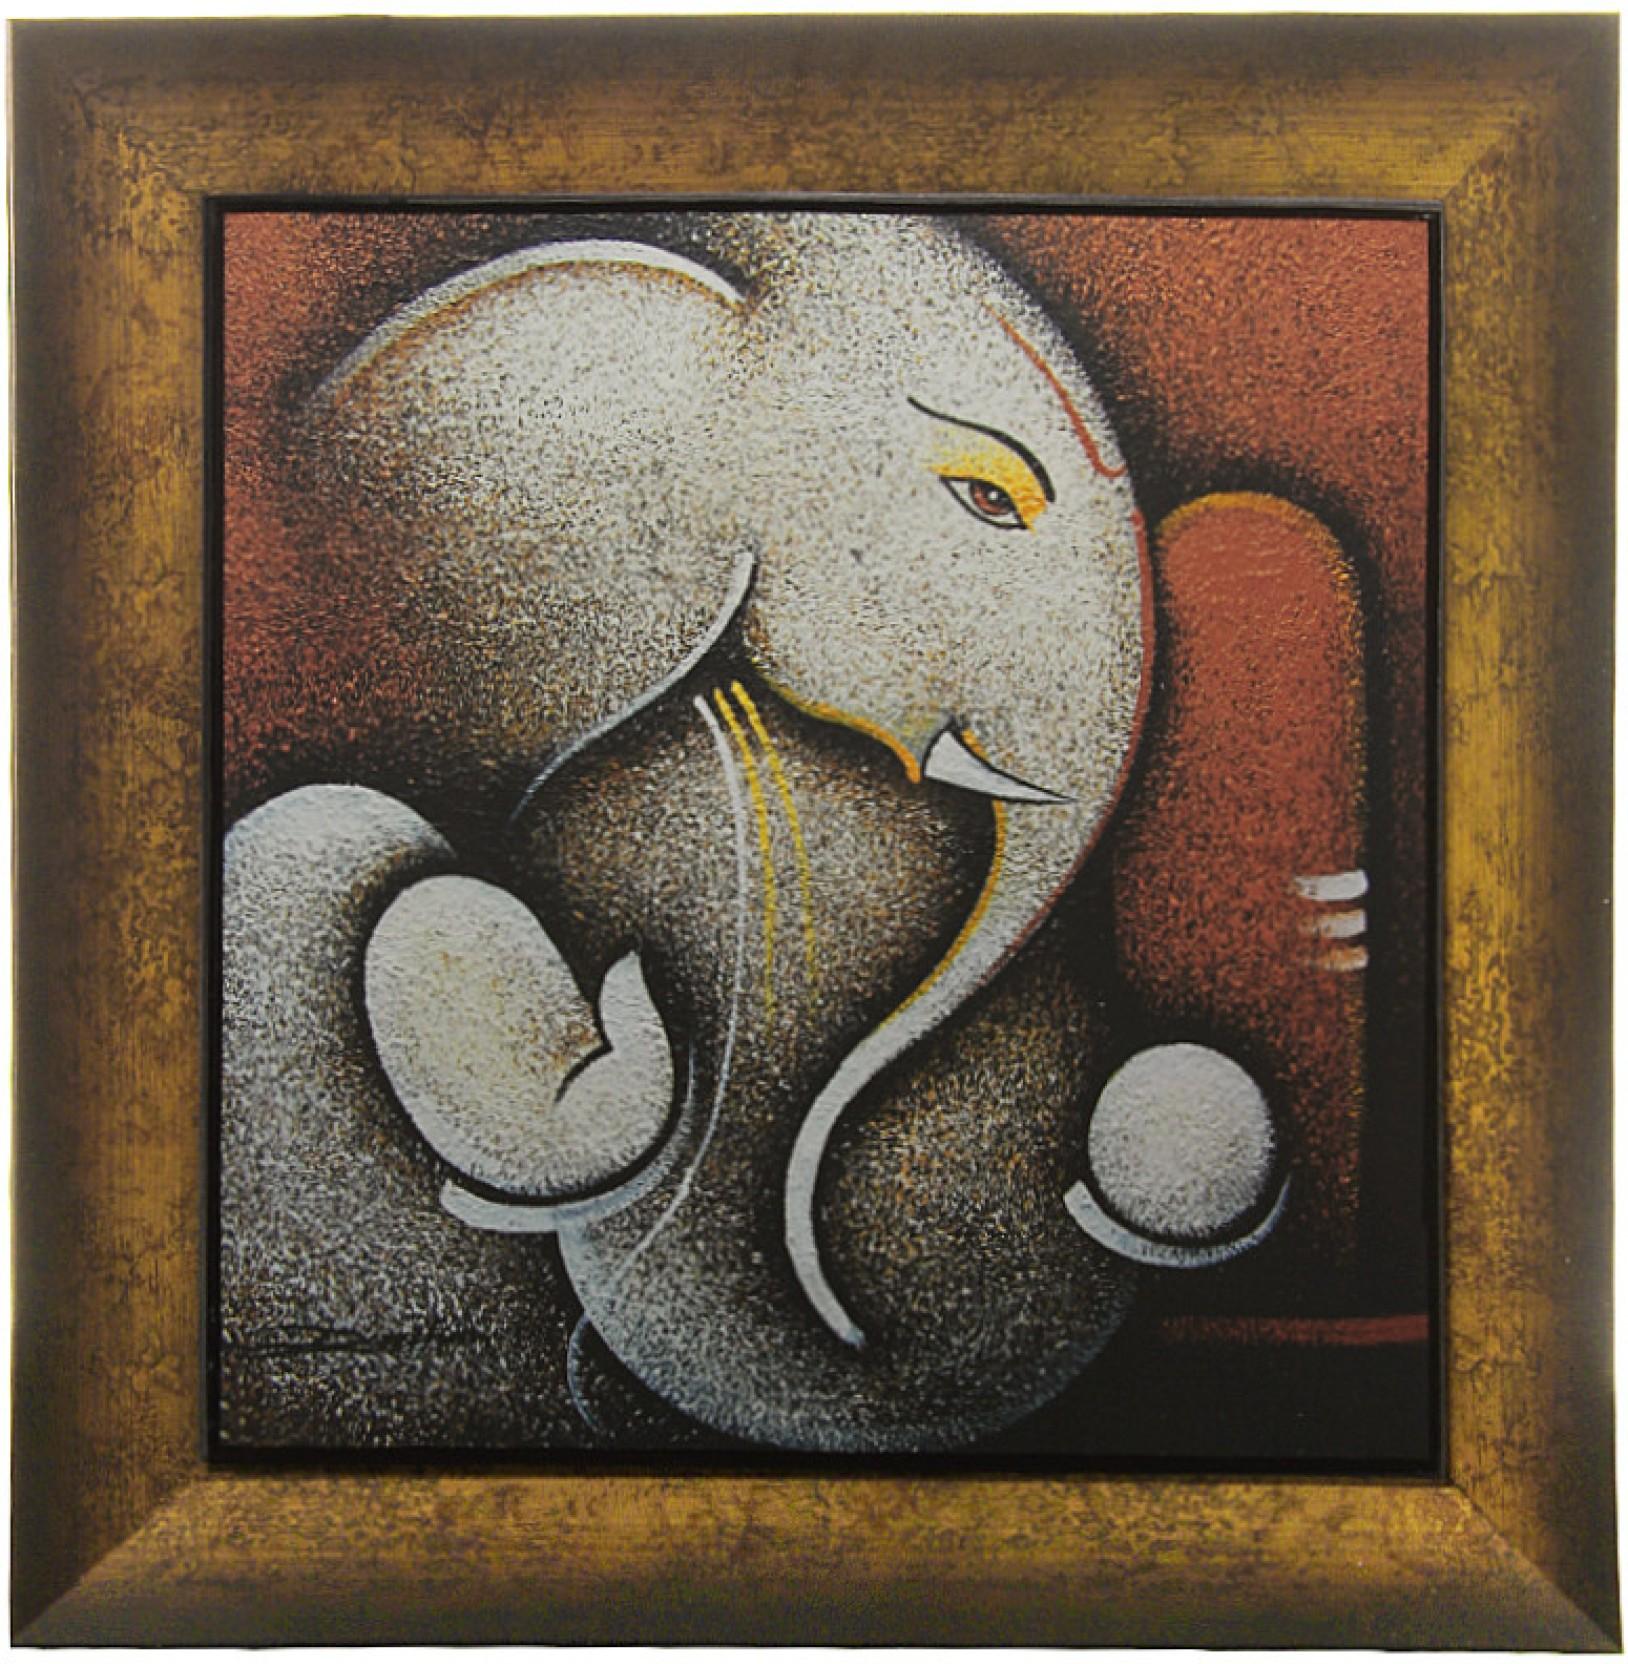 Om Arts Art Paintings Ganesha Reprint Oil Painting Price ...